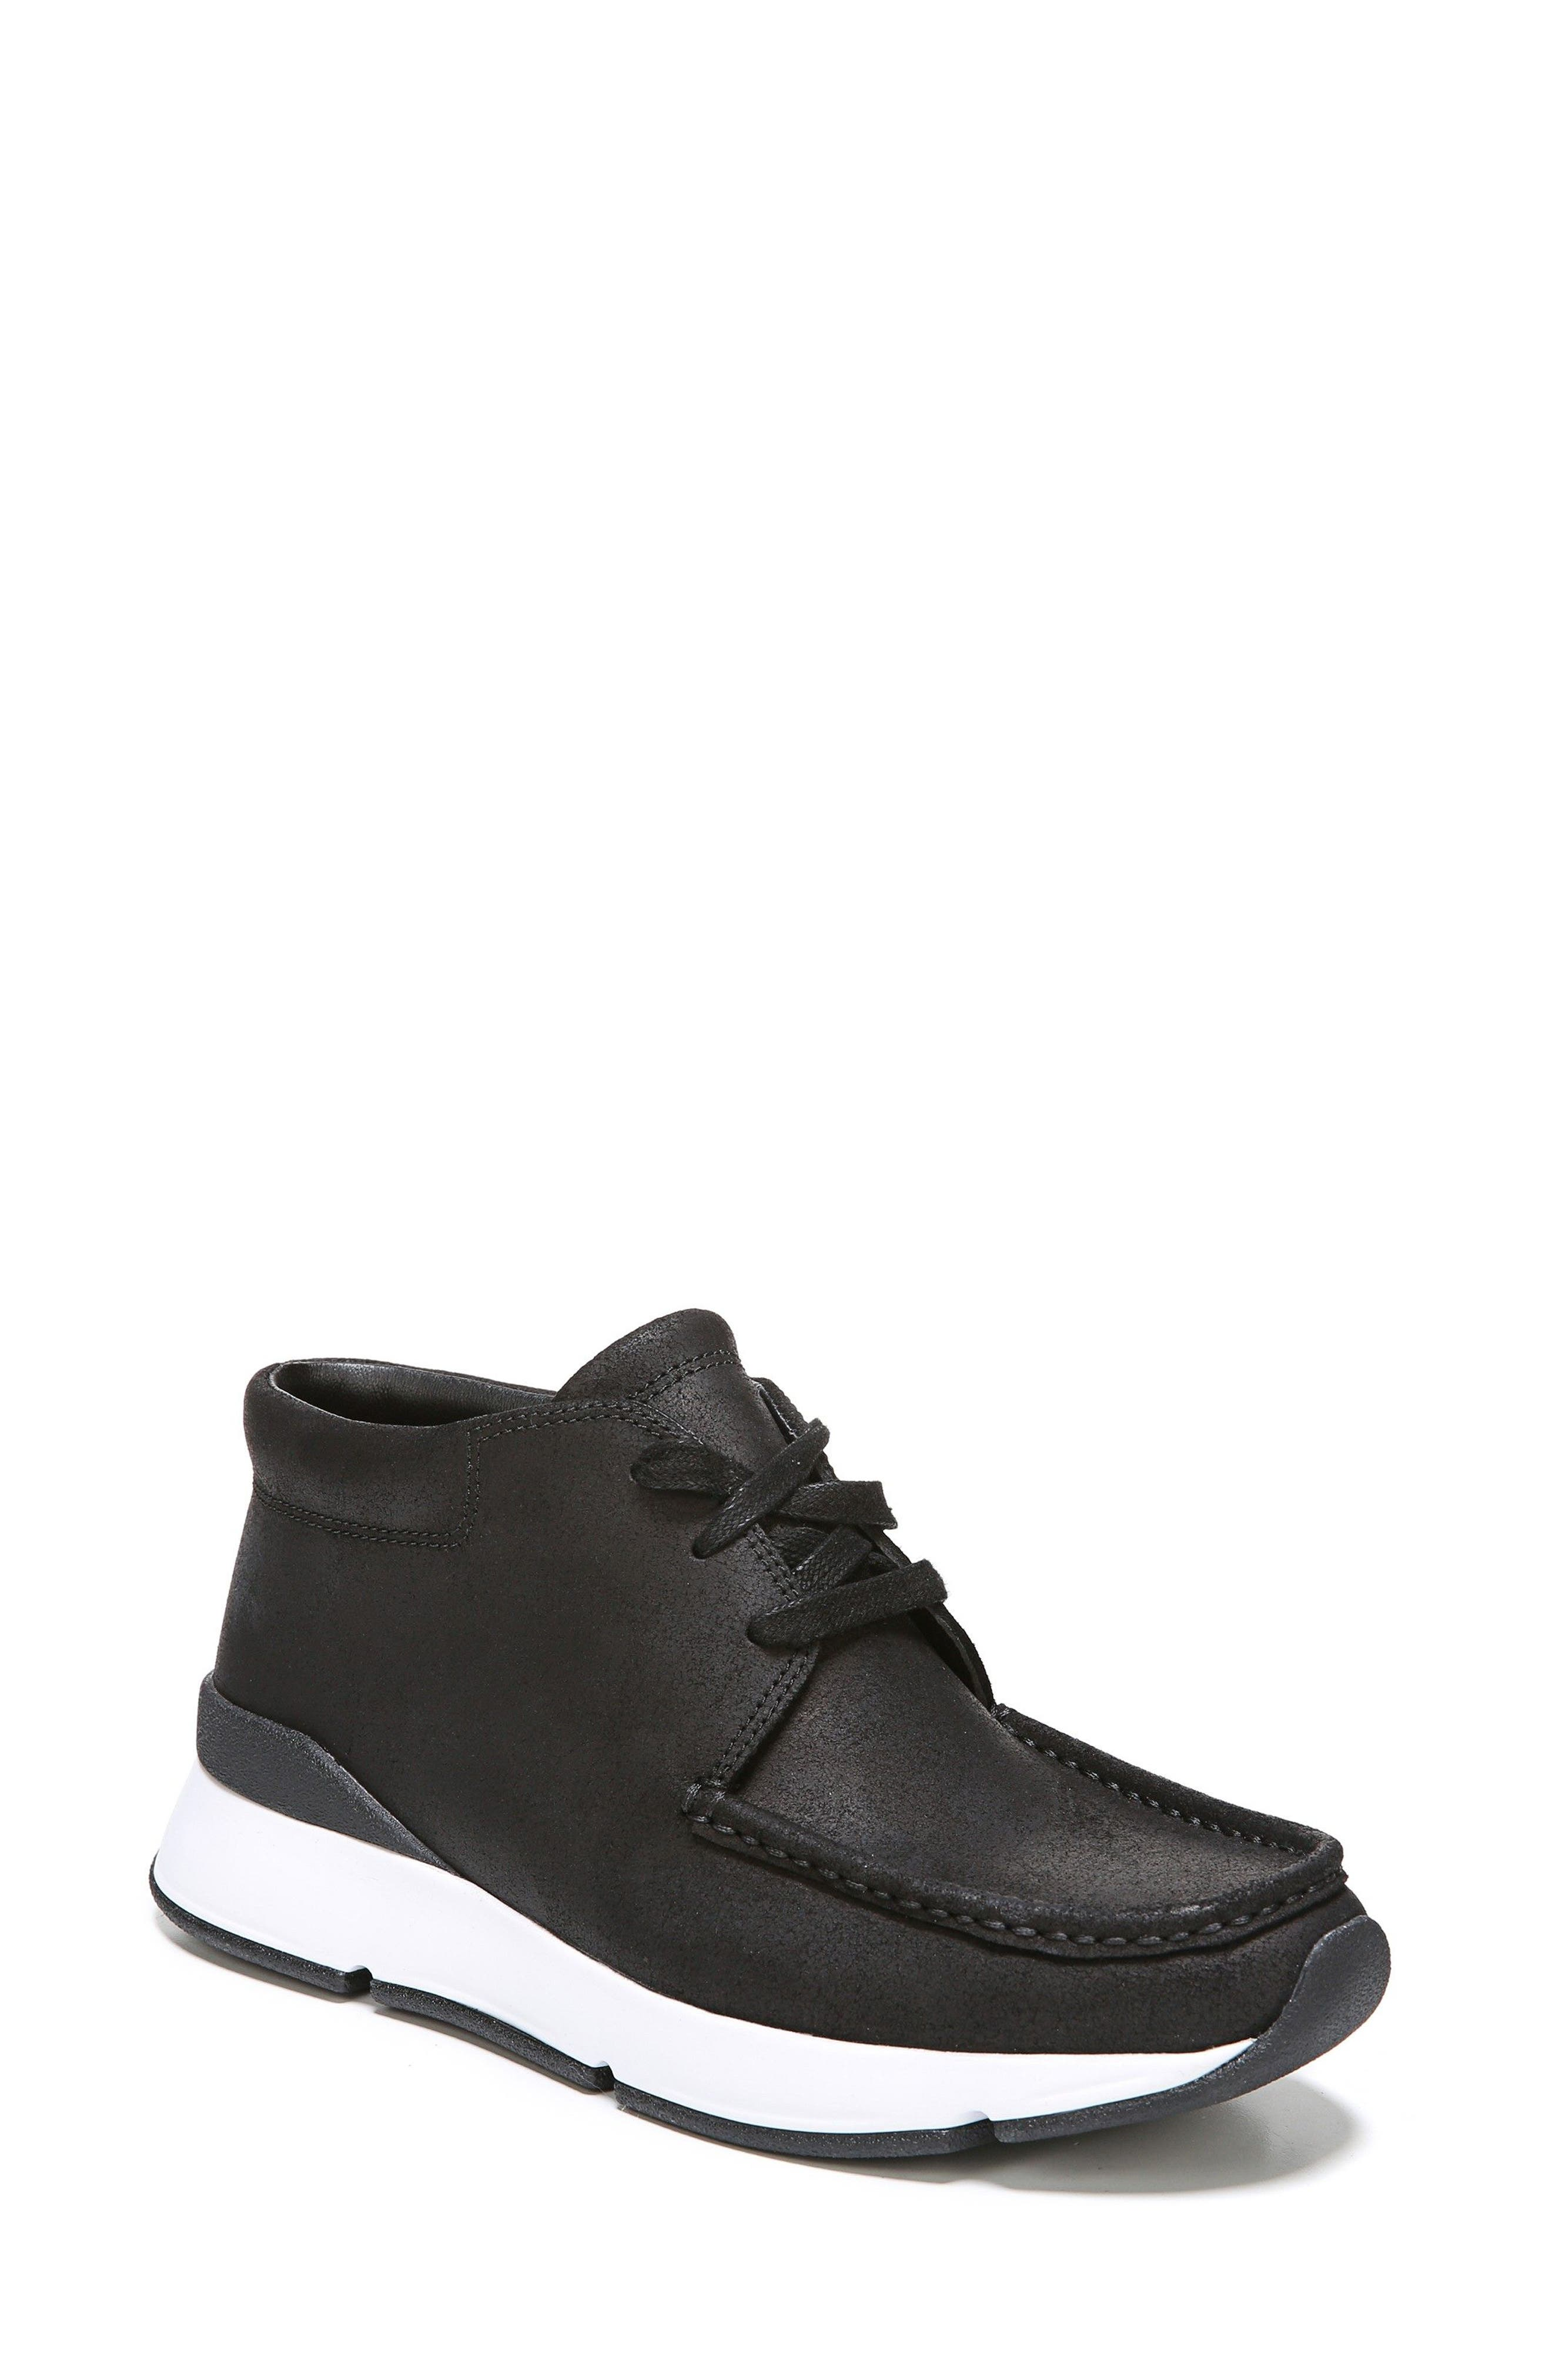 Toronto Chukka Sneaker,                             Main thumbnail 1, color,                             002